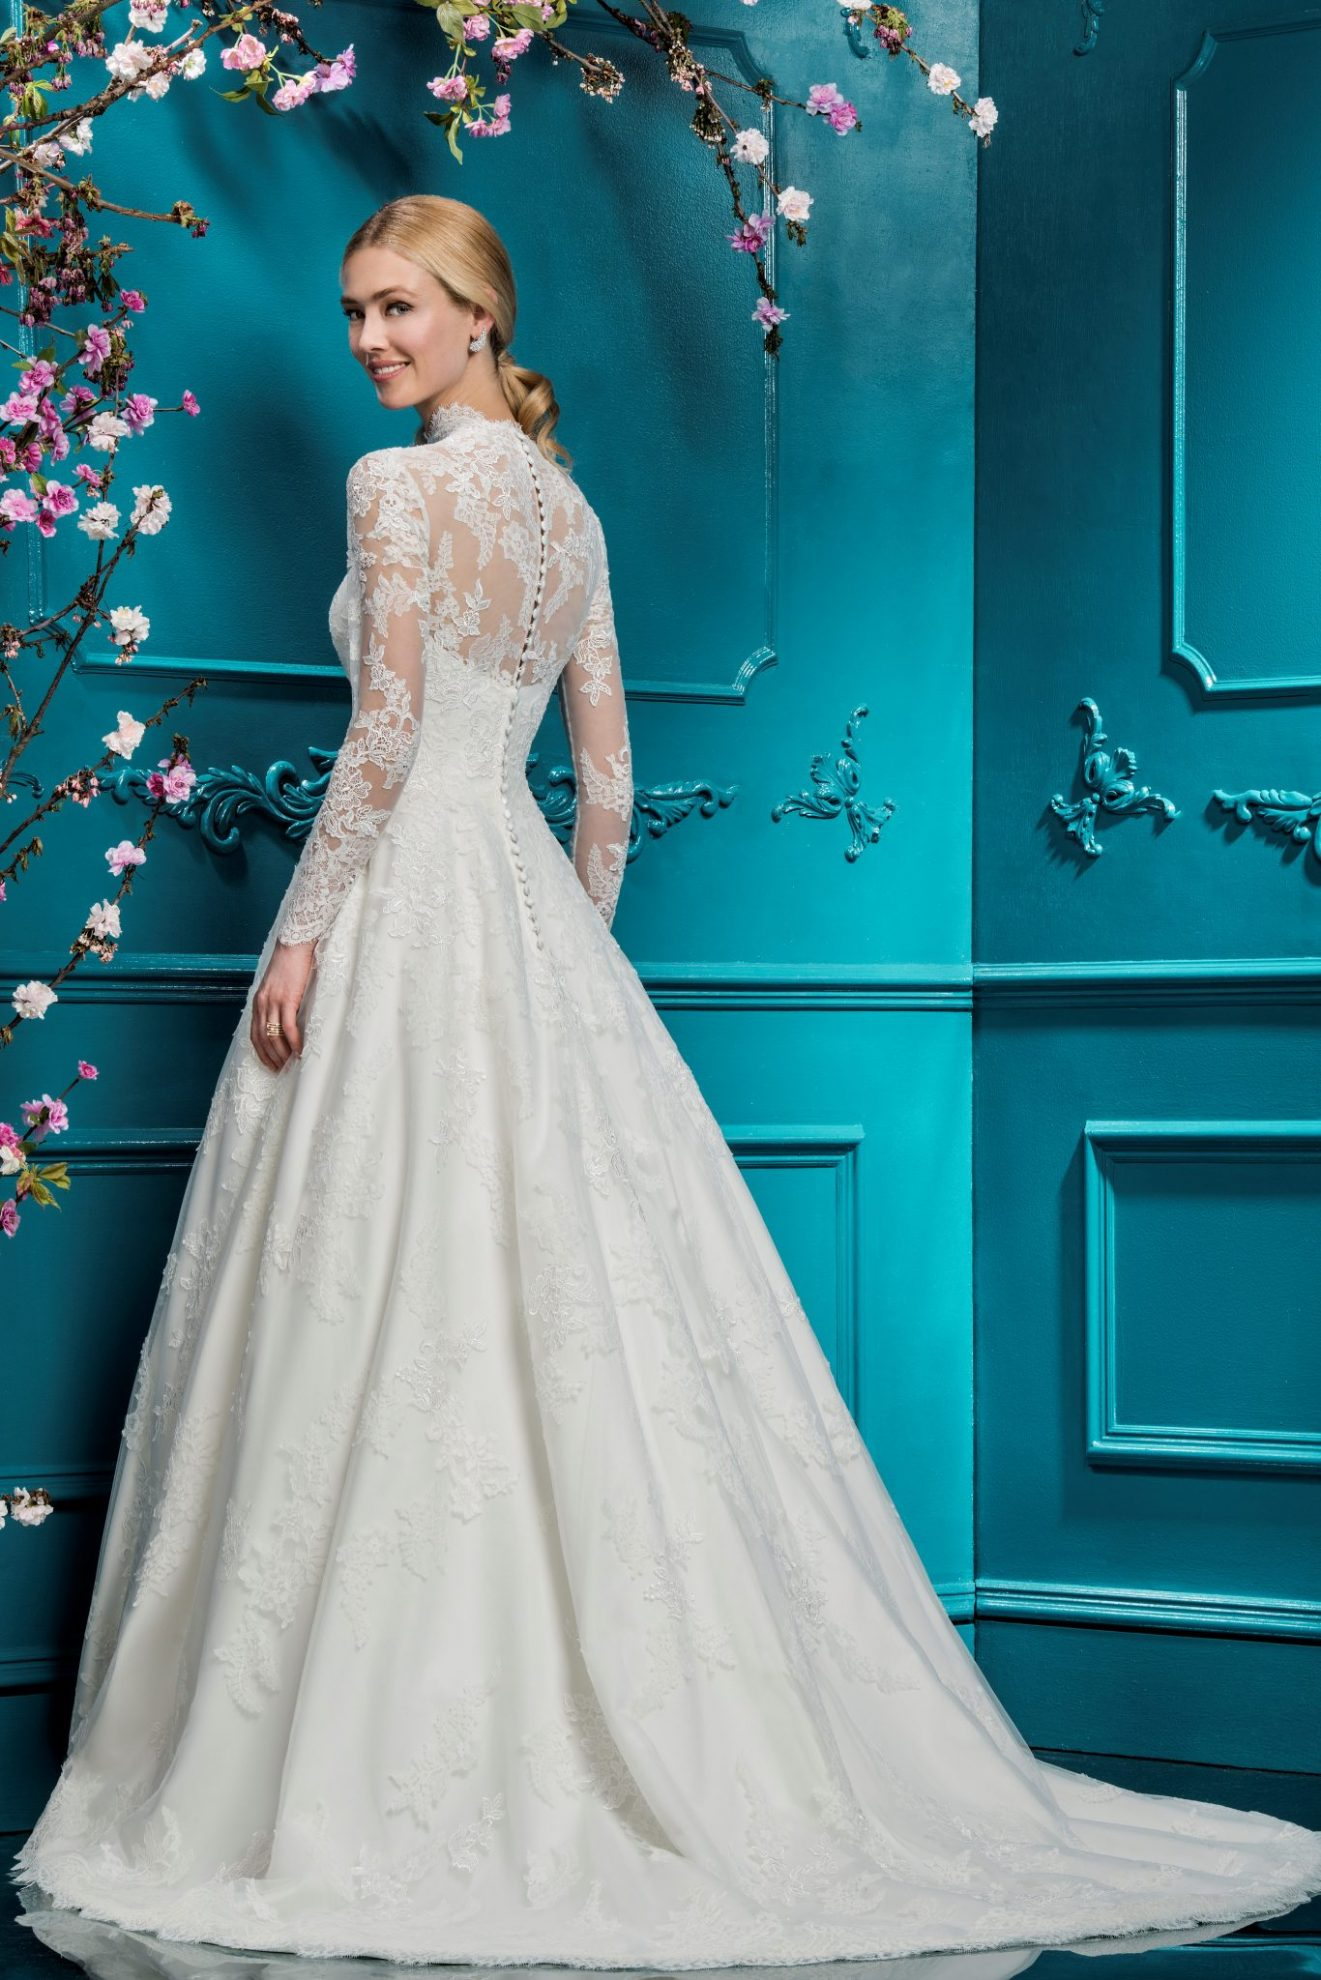 10 Stunning Long-Sleeved Wedding Dresses | Wedding Journal